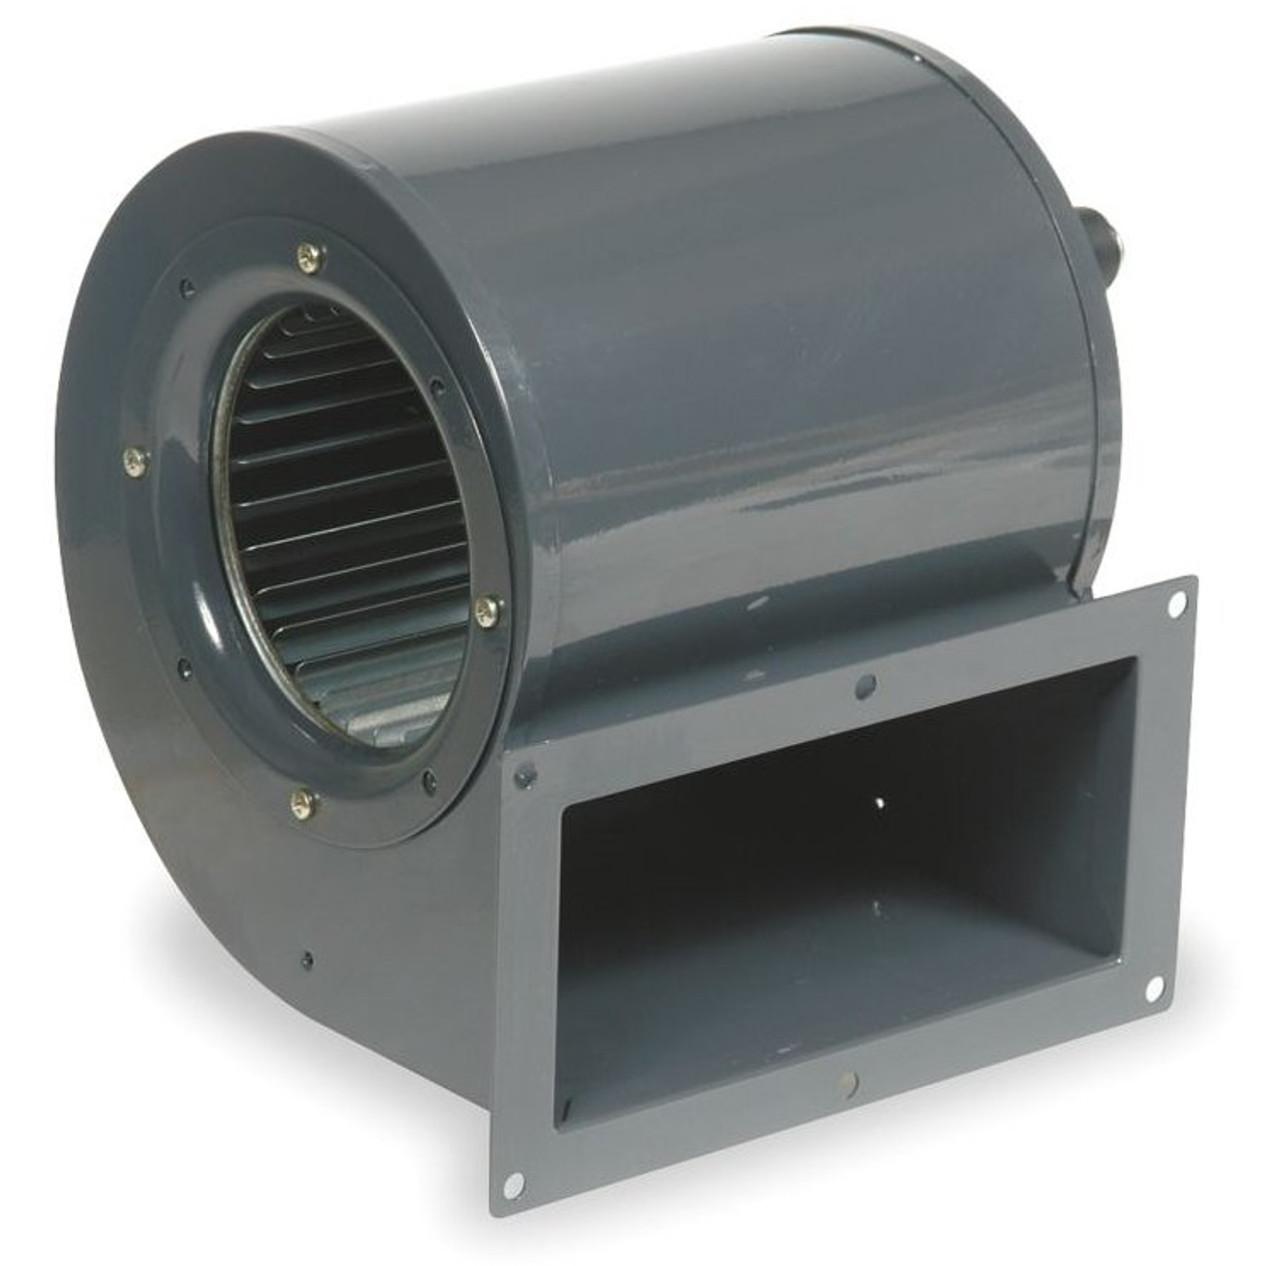 JE2J047 Replaces: Dayton 1TDT8 5C508 /& Century 9459 JE2J047NS 3.3 Diameter Motor Blower